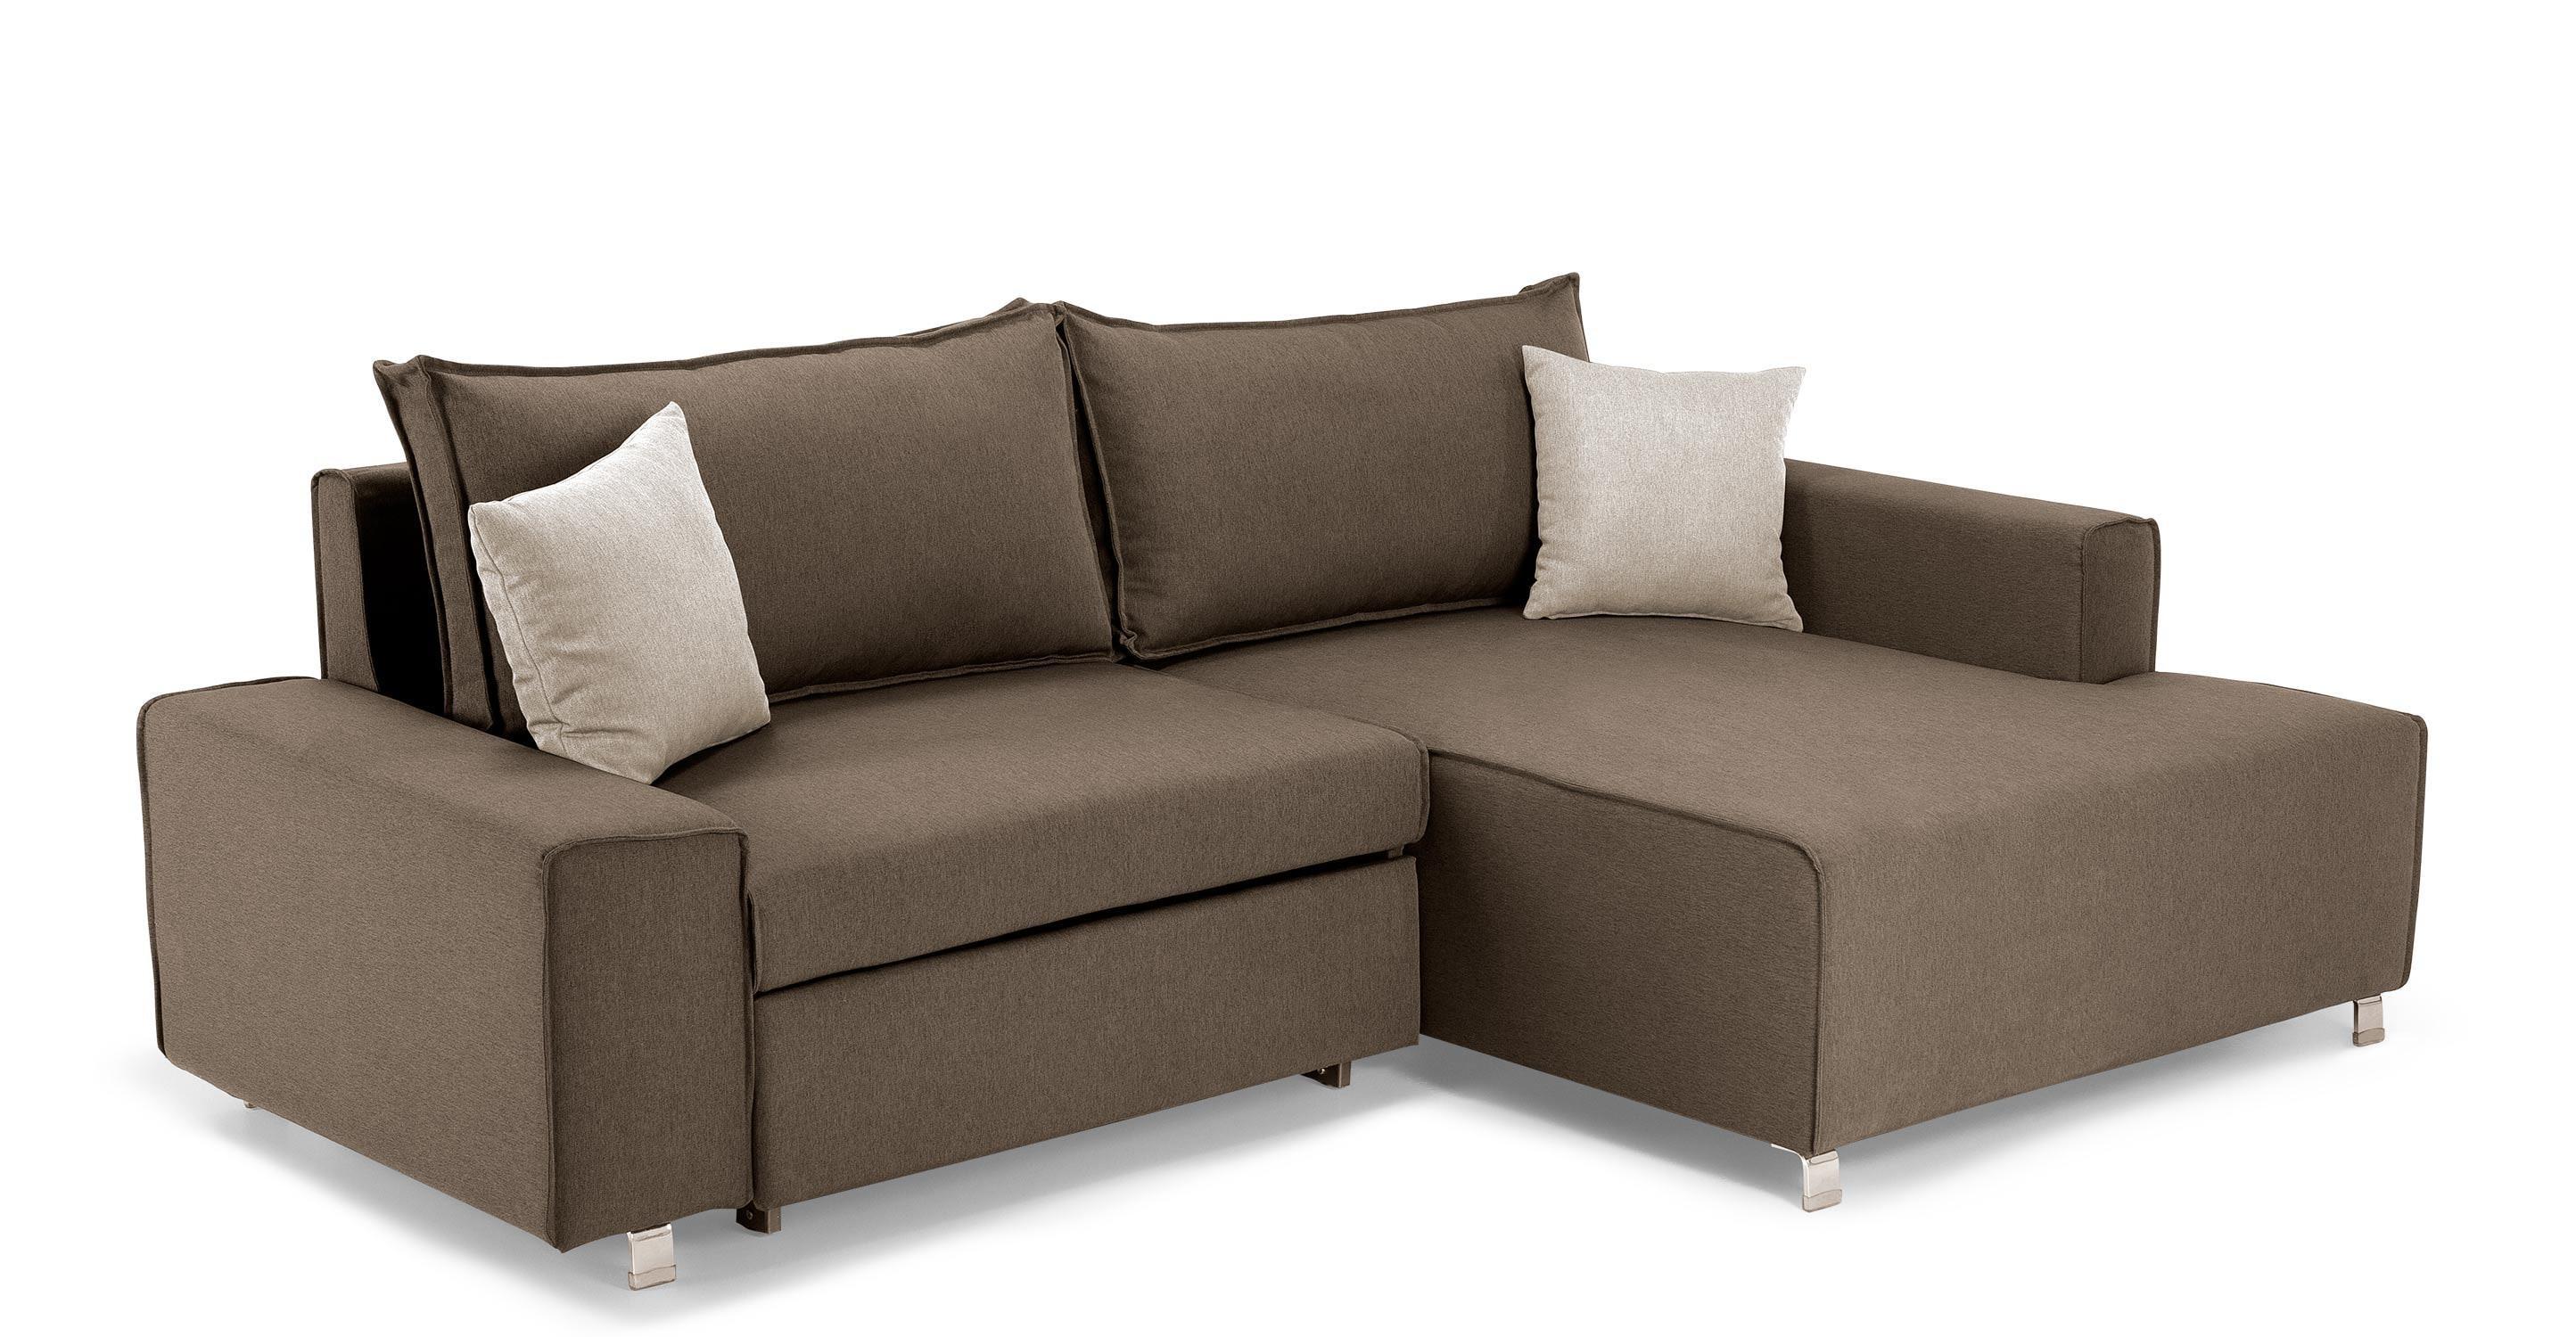 Sofas Center : Corner Sofa Beds Uk Cheap Birminghamcorner For Intended For Cheap Corner Sofa Bed (Image 16 of 20)